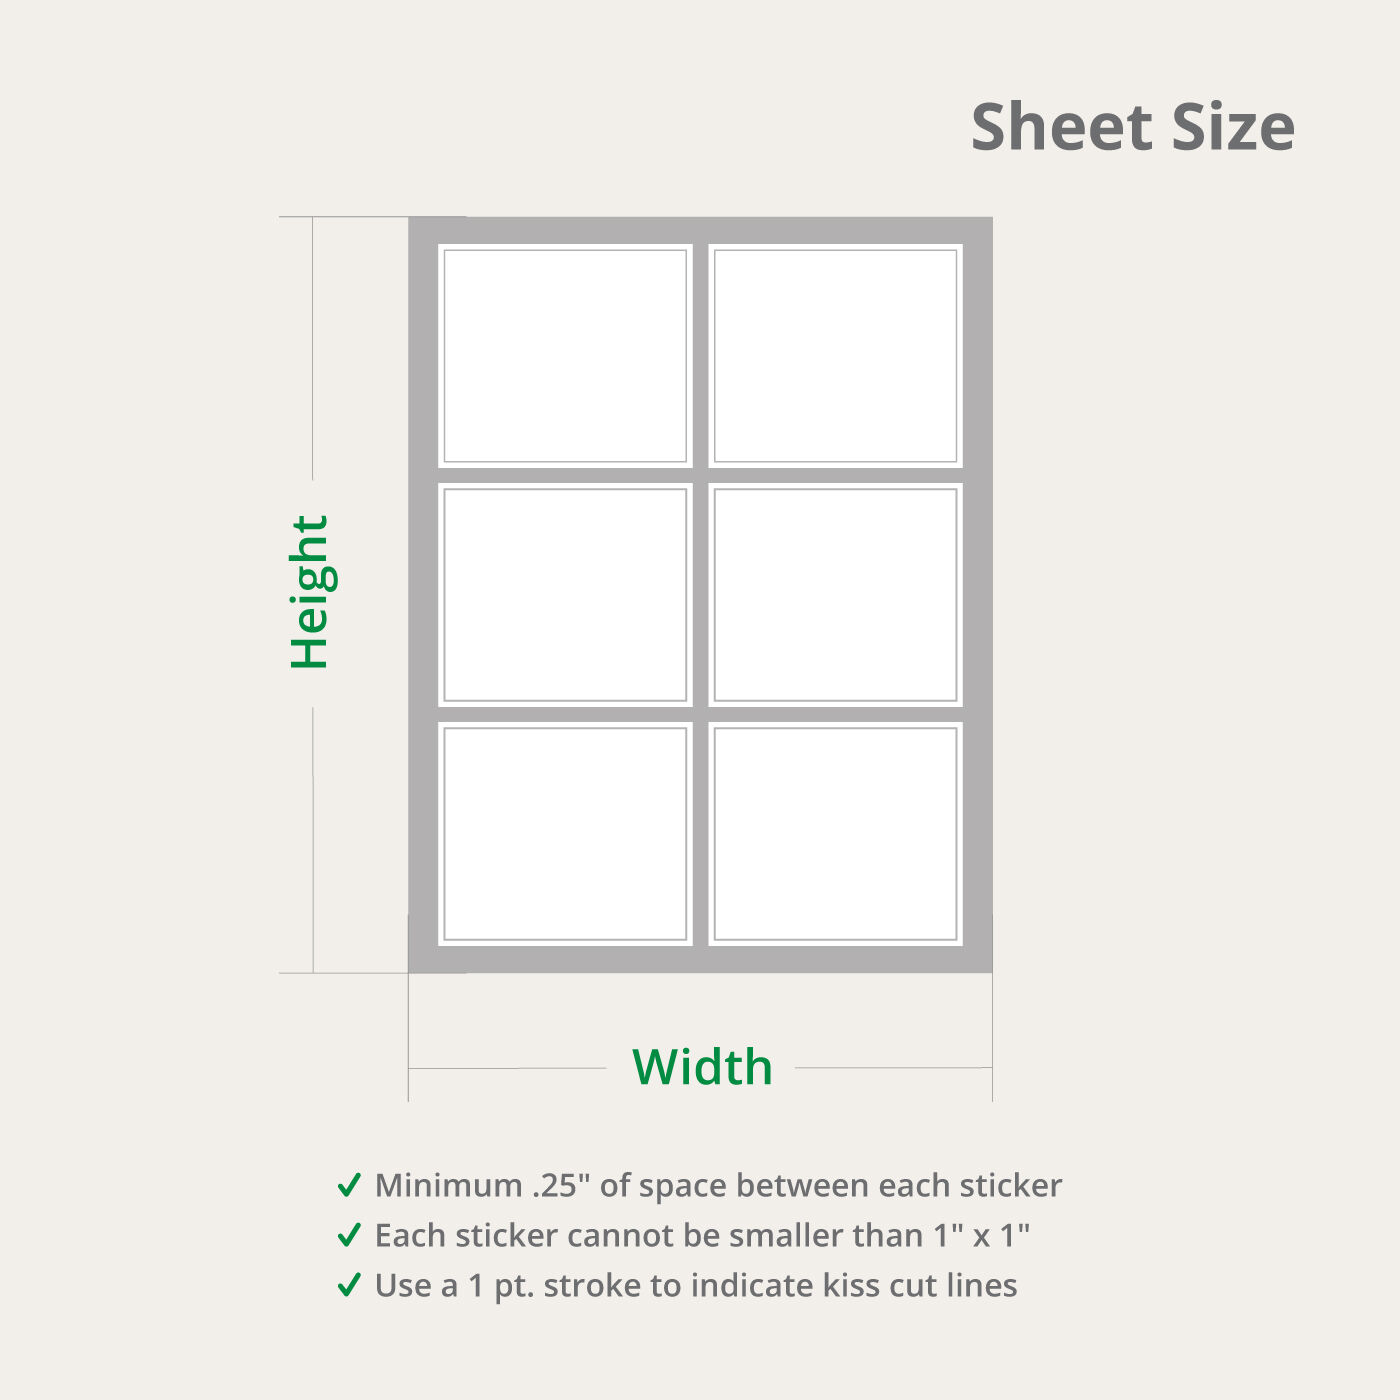 Sheet Size